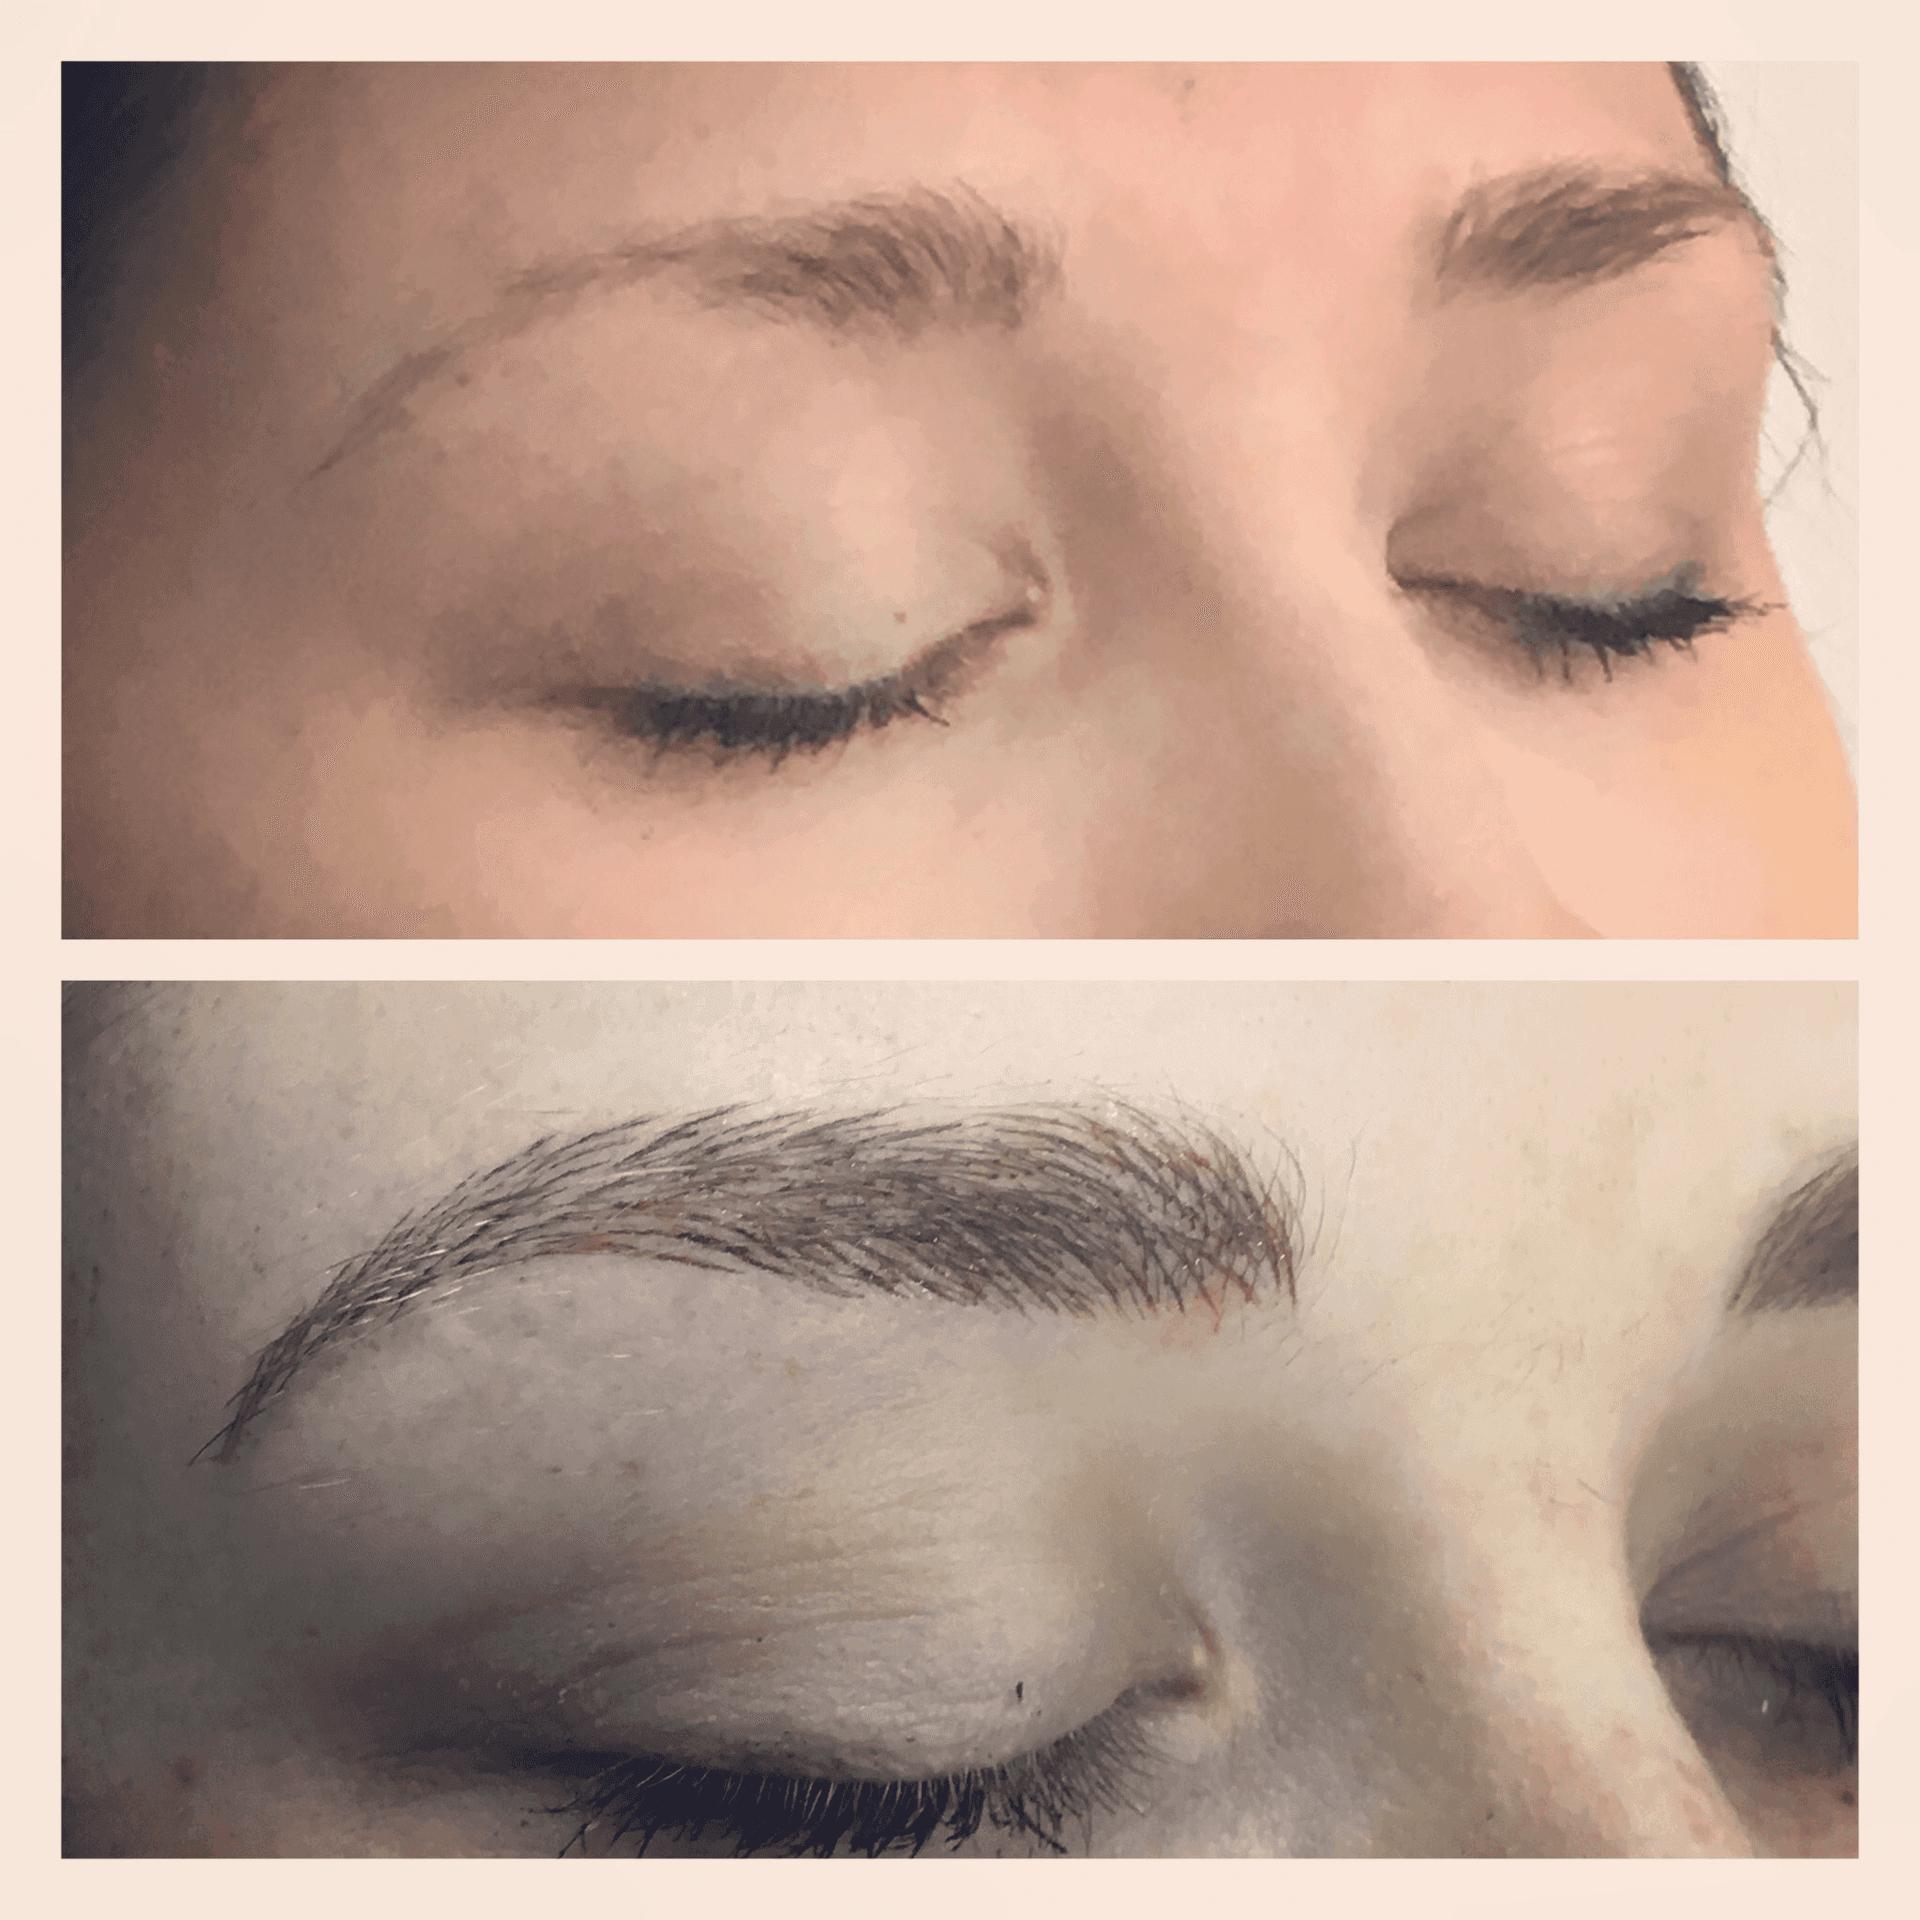 make-up treatment